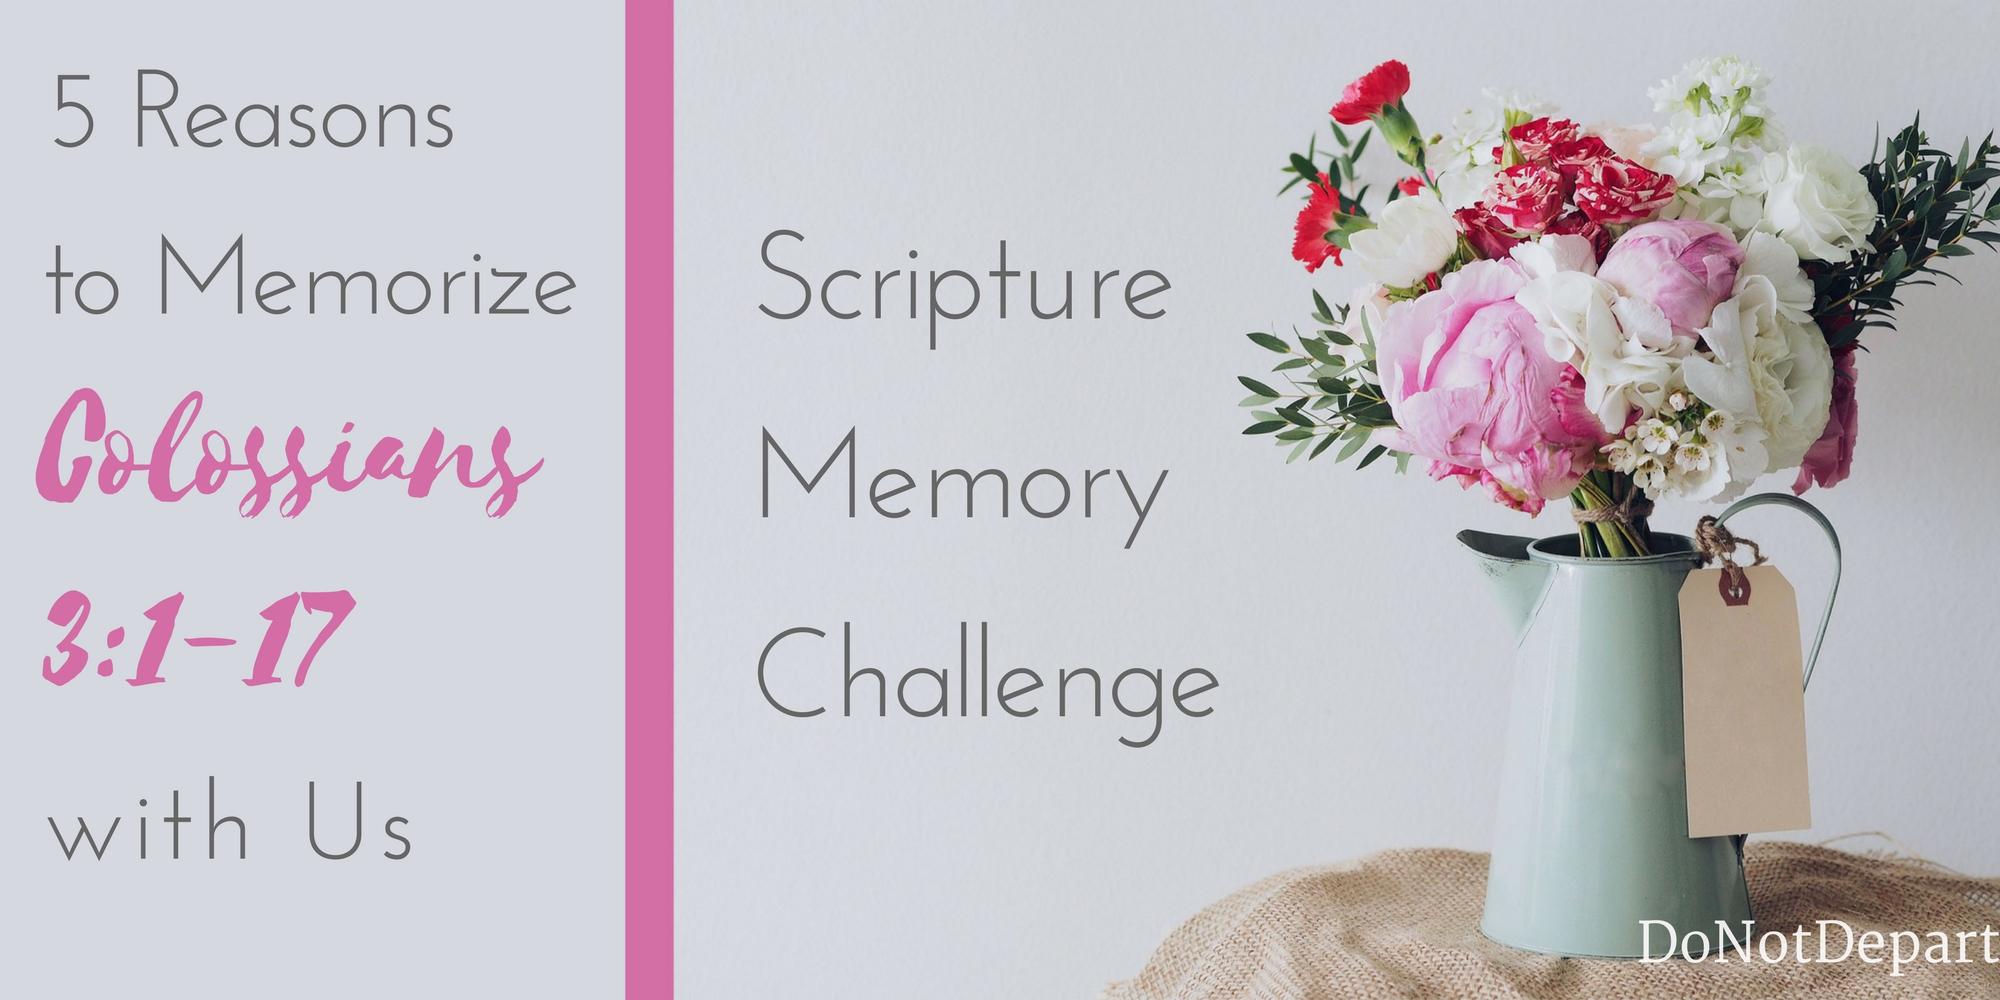 5-Reasons-Memorize-Colossians-3